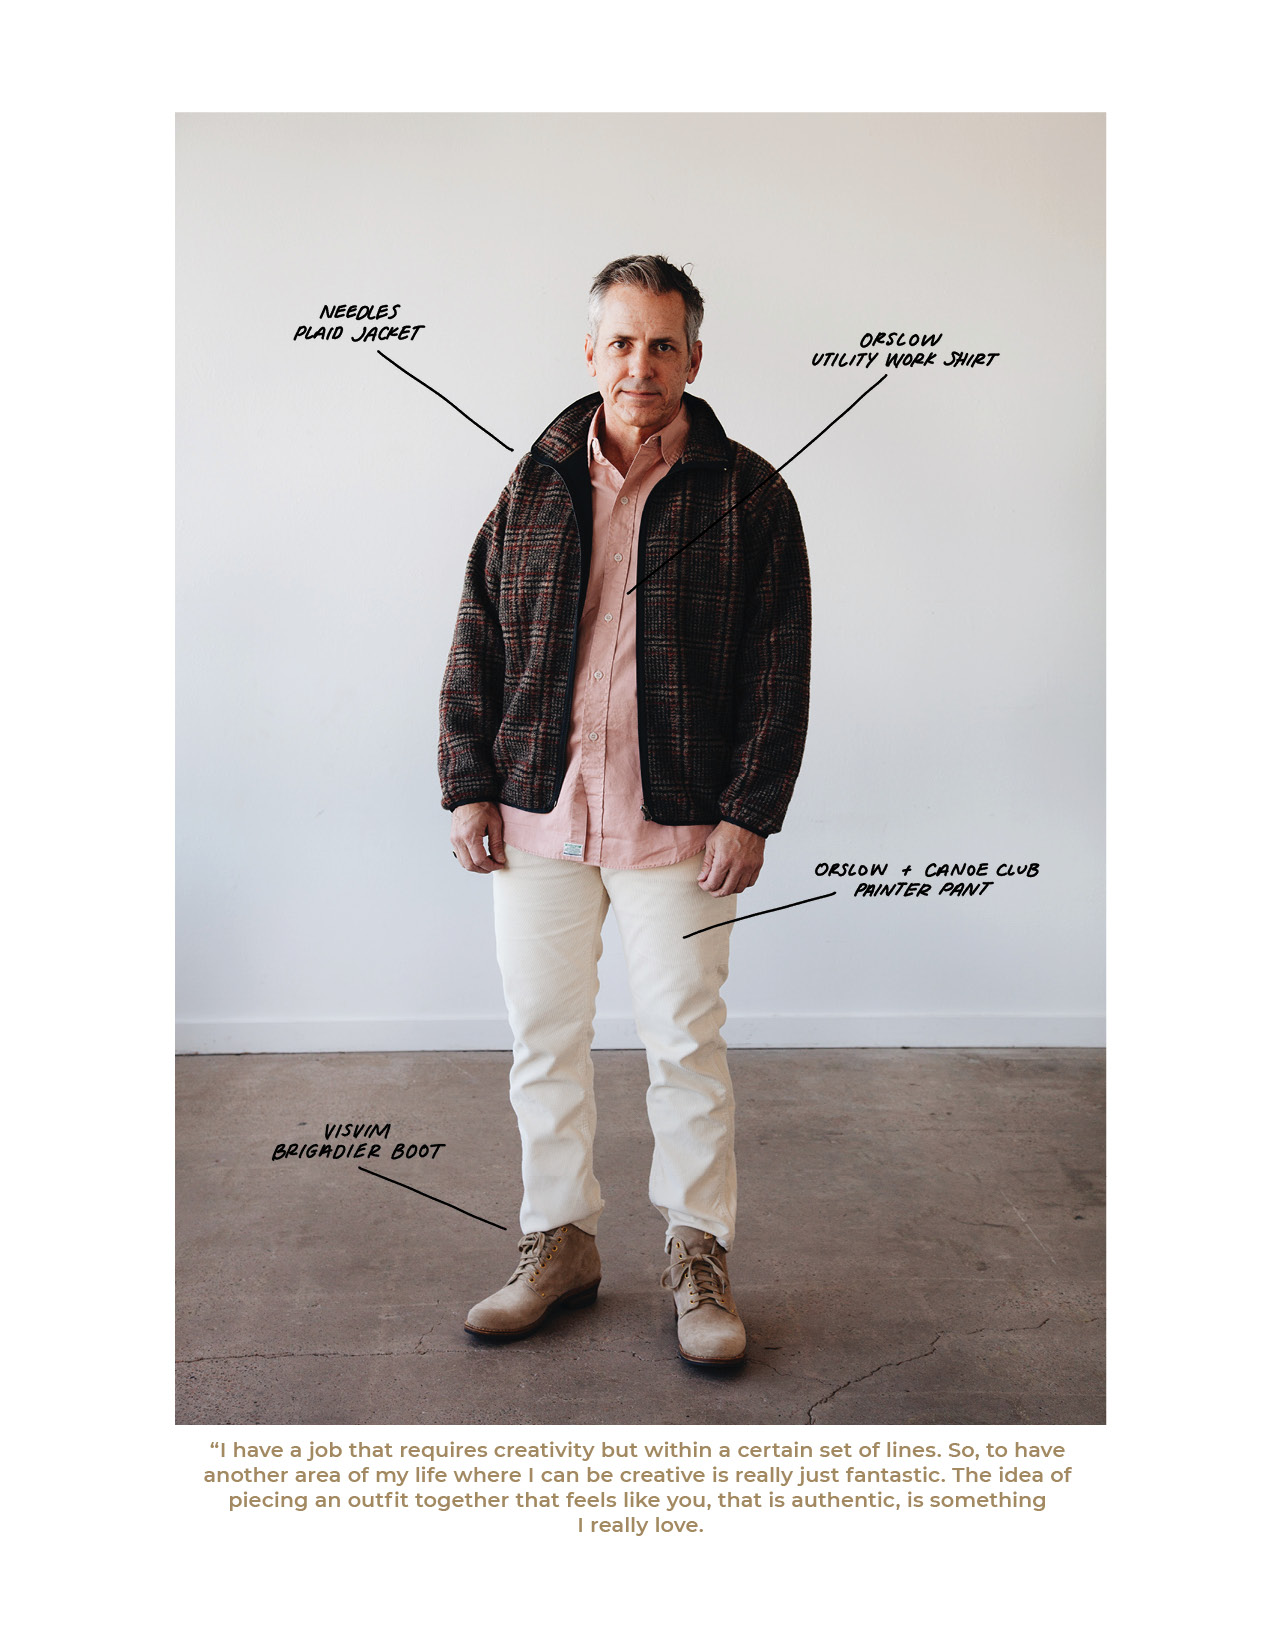 needles plaid jacket, orslow utility work shirt, canoe club x orslow painter pant, and visvim brigadier boots on body